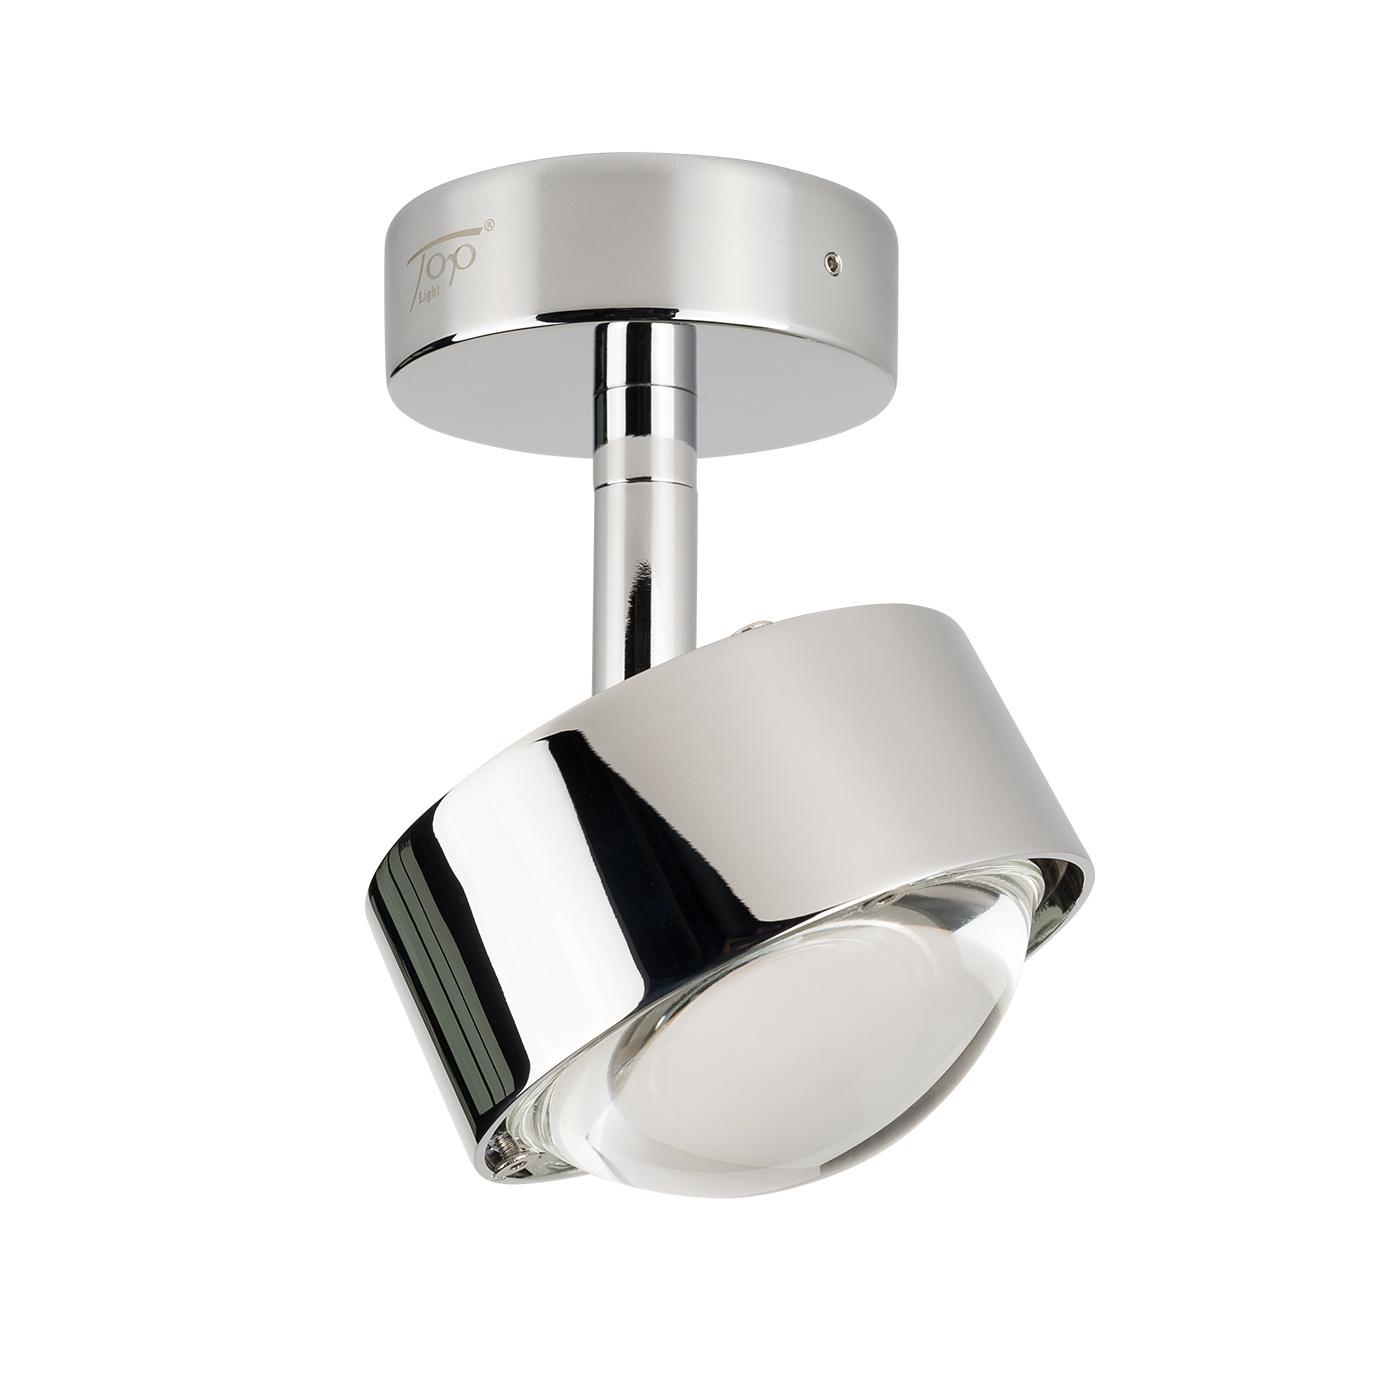 Top Light PUK Turn LED downlight